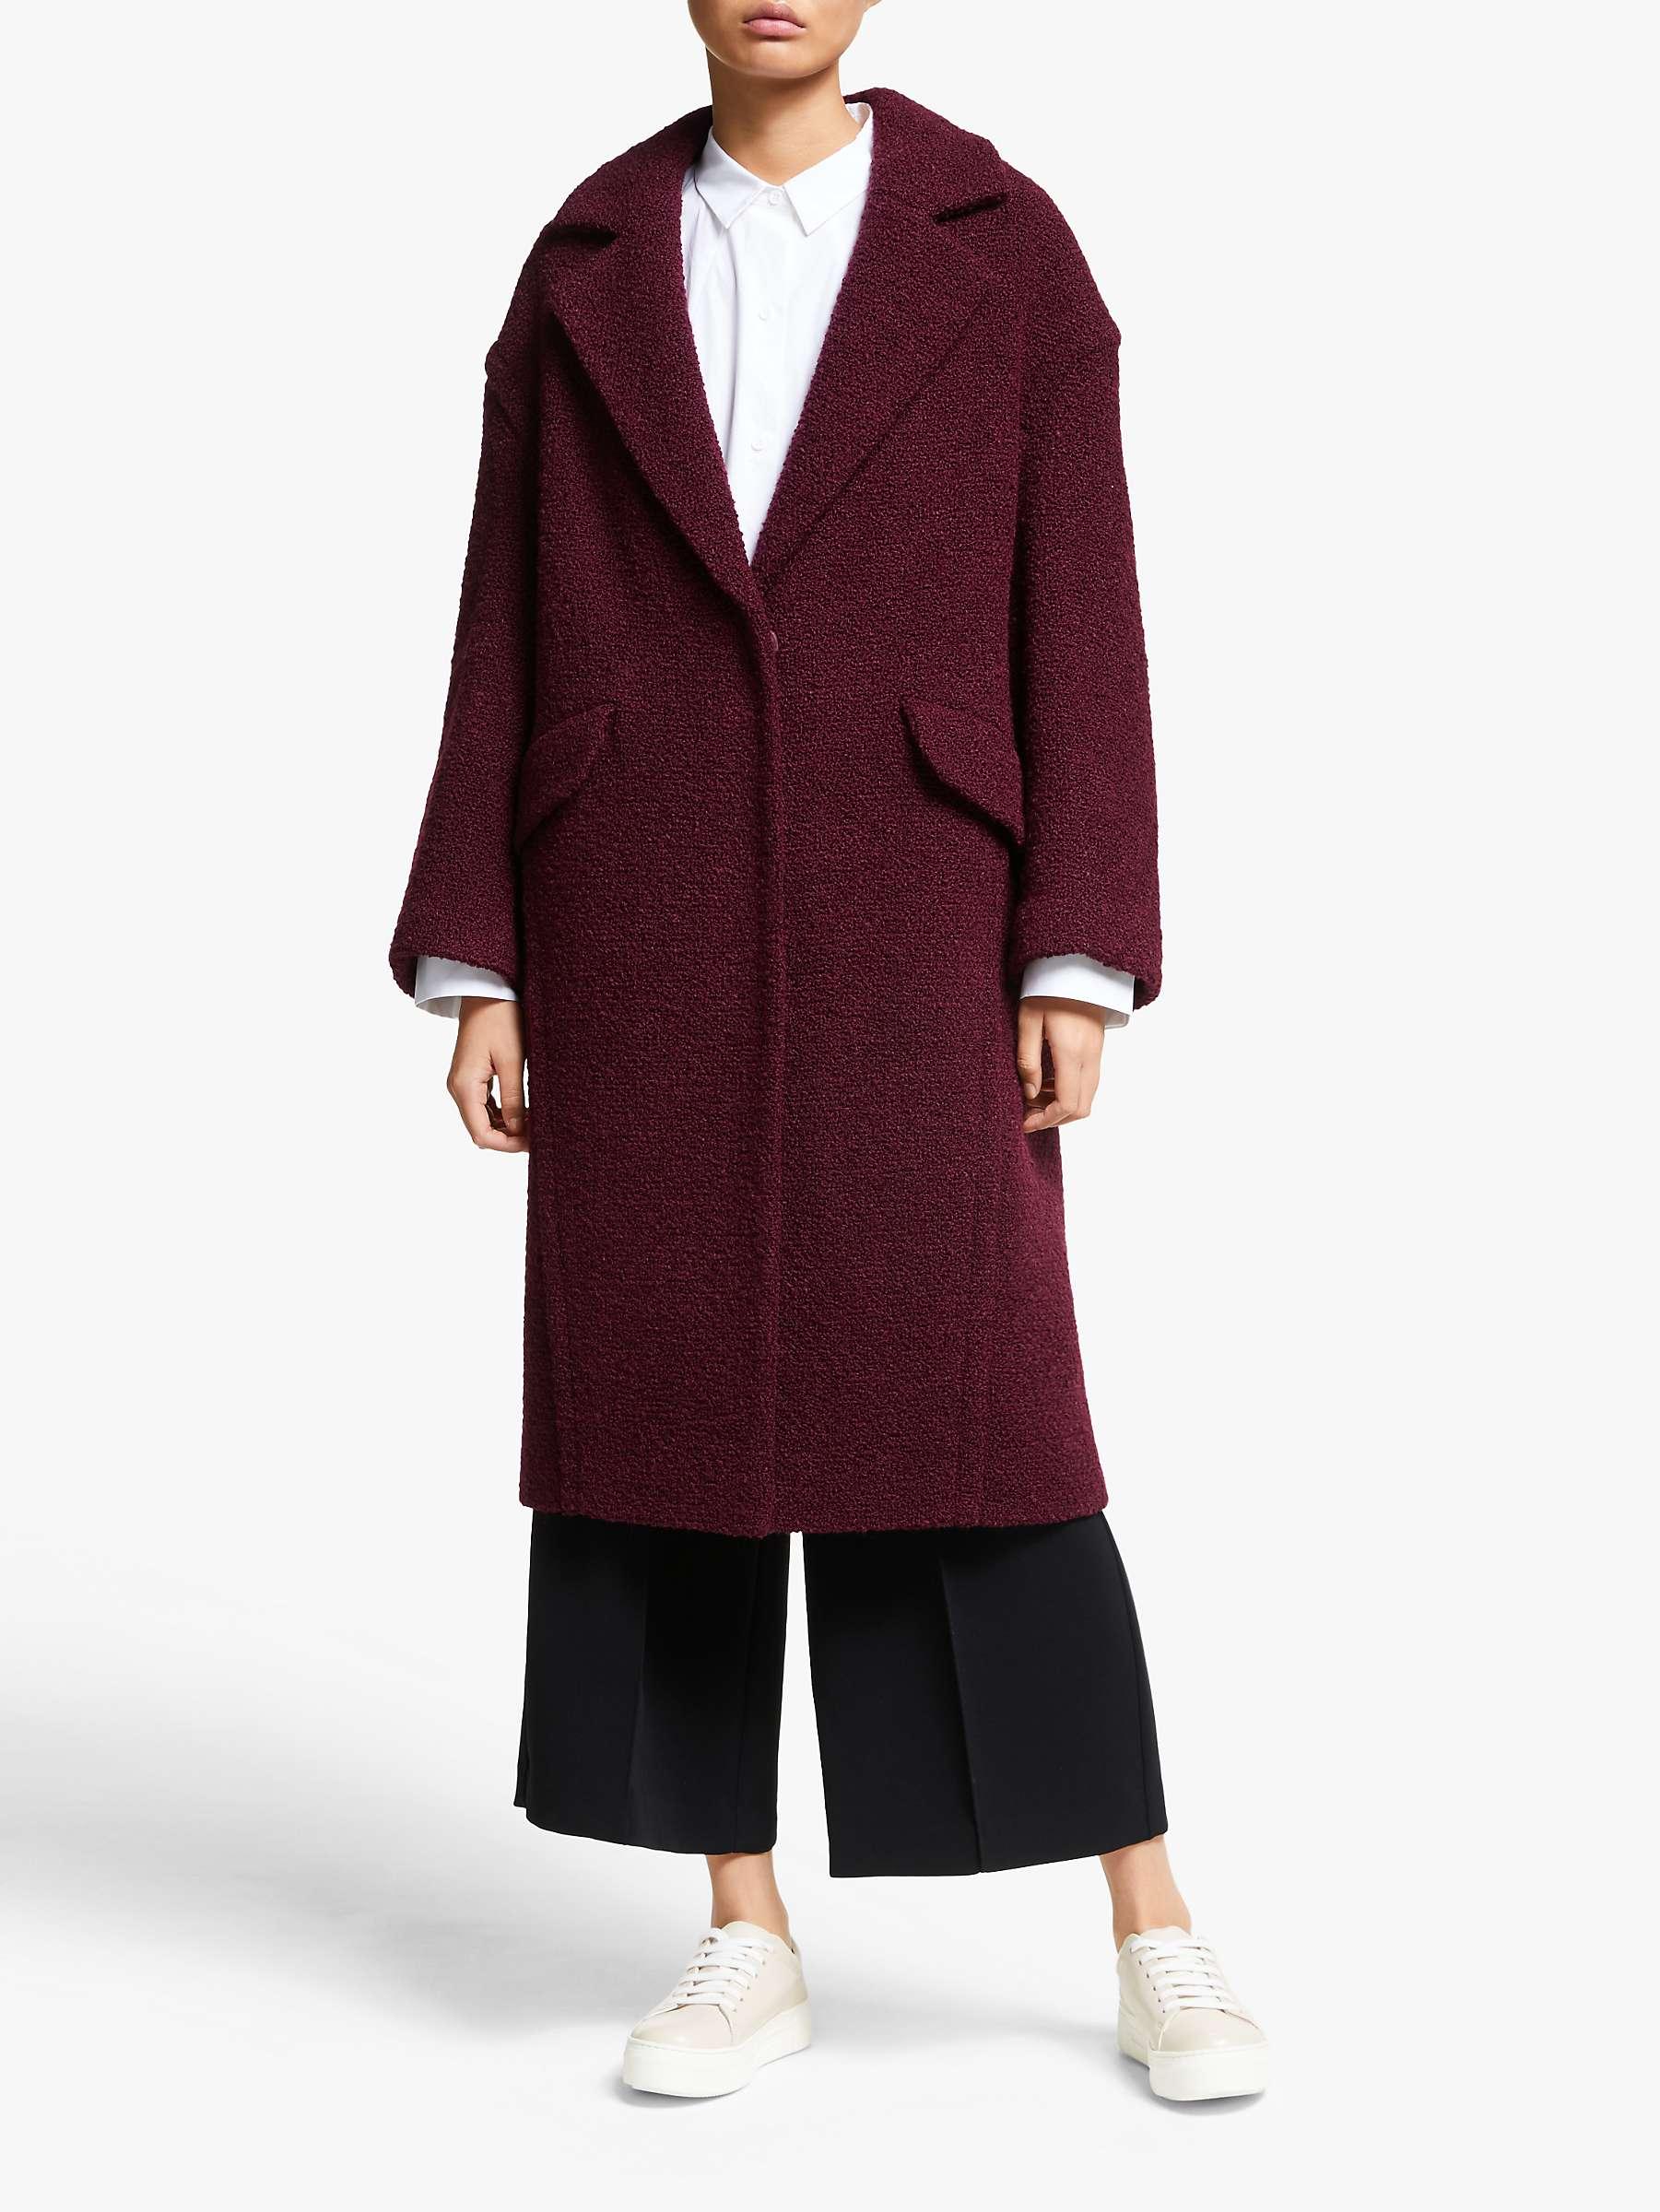 Kin Angled Seam Cocoon Coat, Dark Red by John Lewis